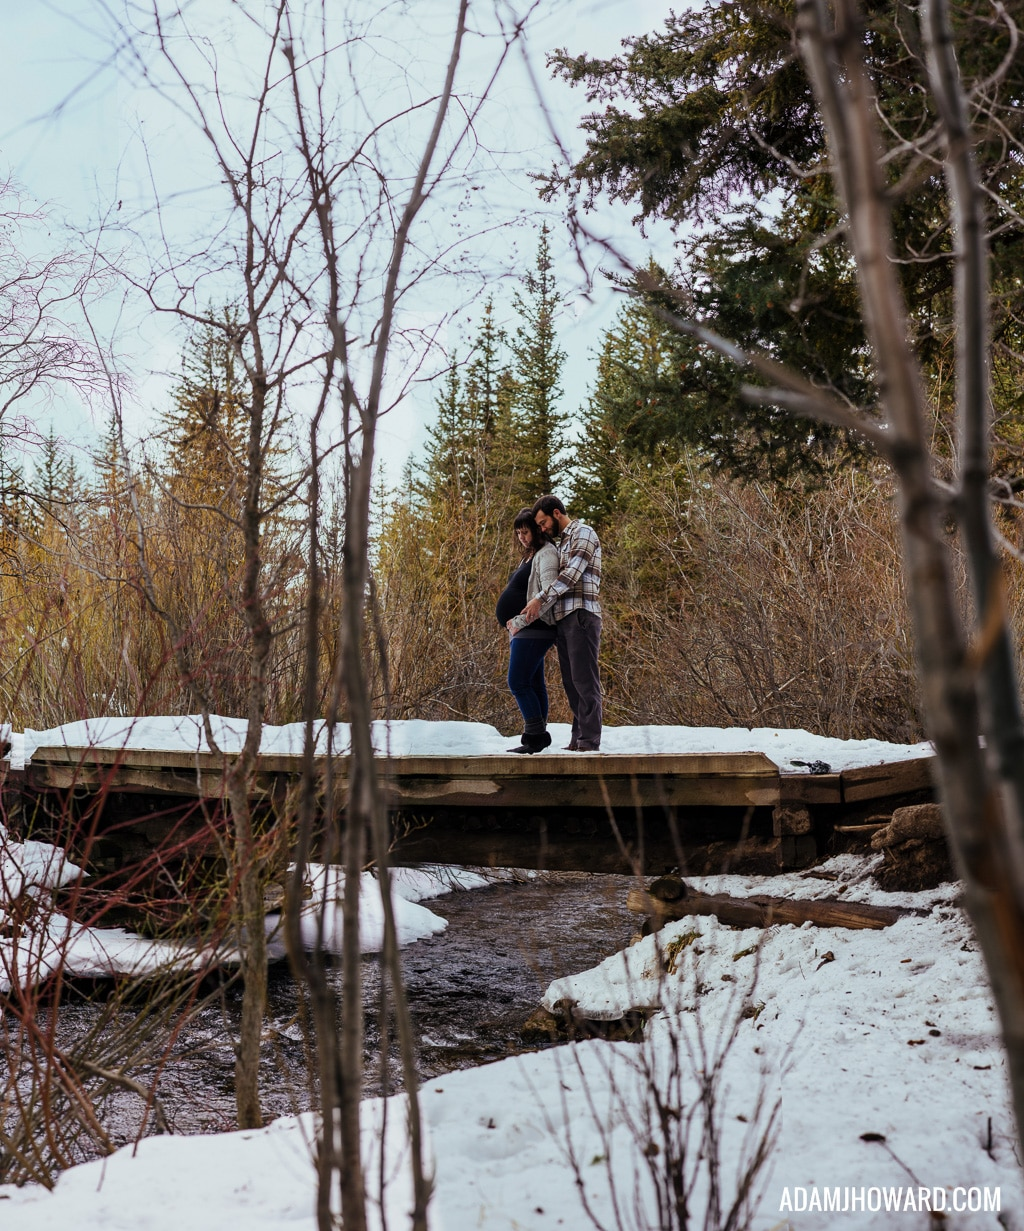 Brenizer Method, Jackson Hole Maternity Photographer, Maternity Session, Winter, Snow, Bridge